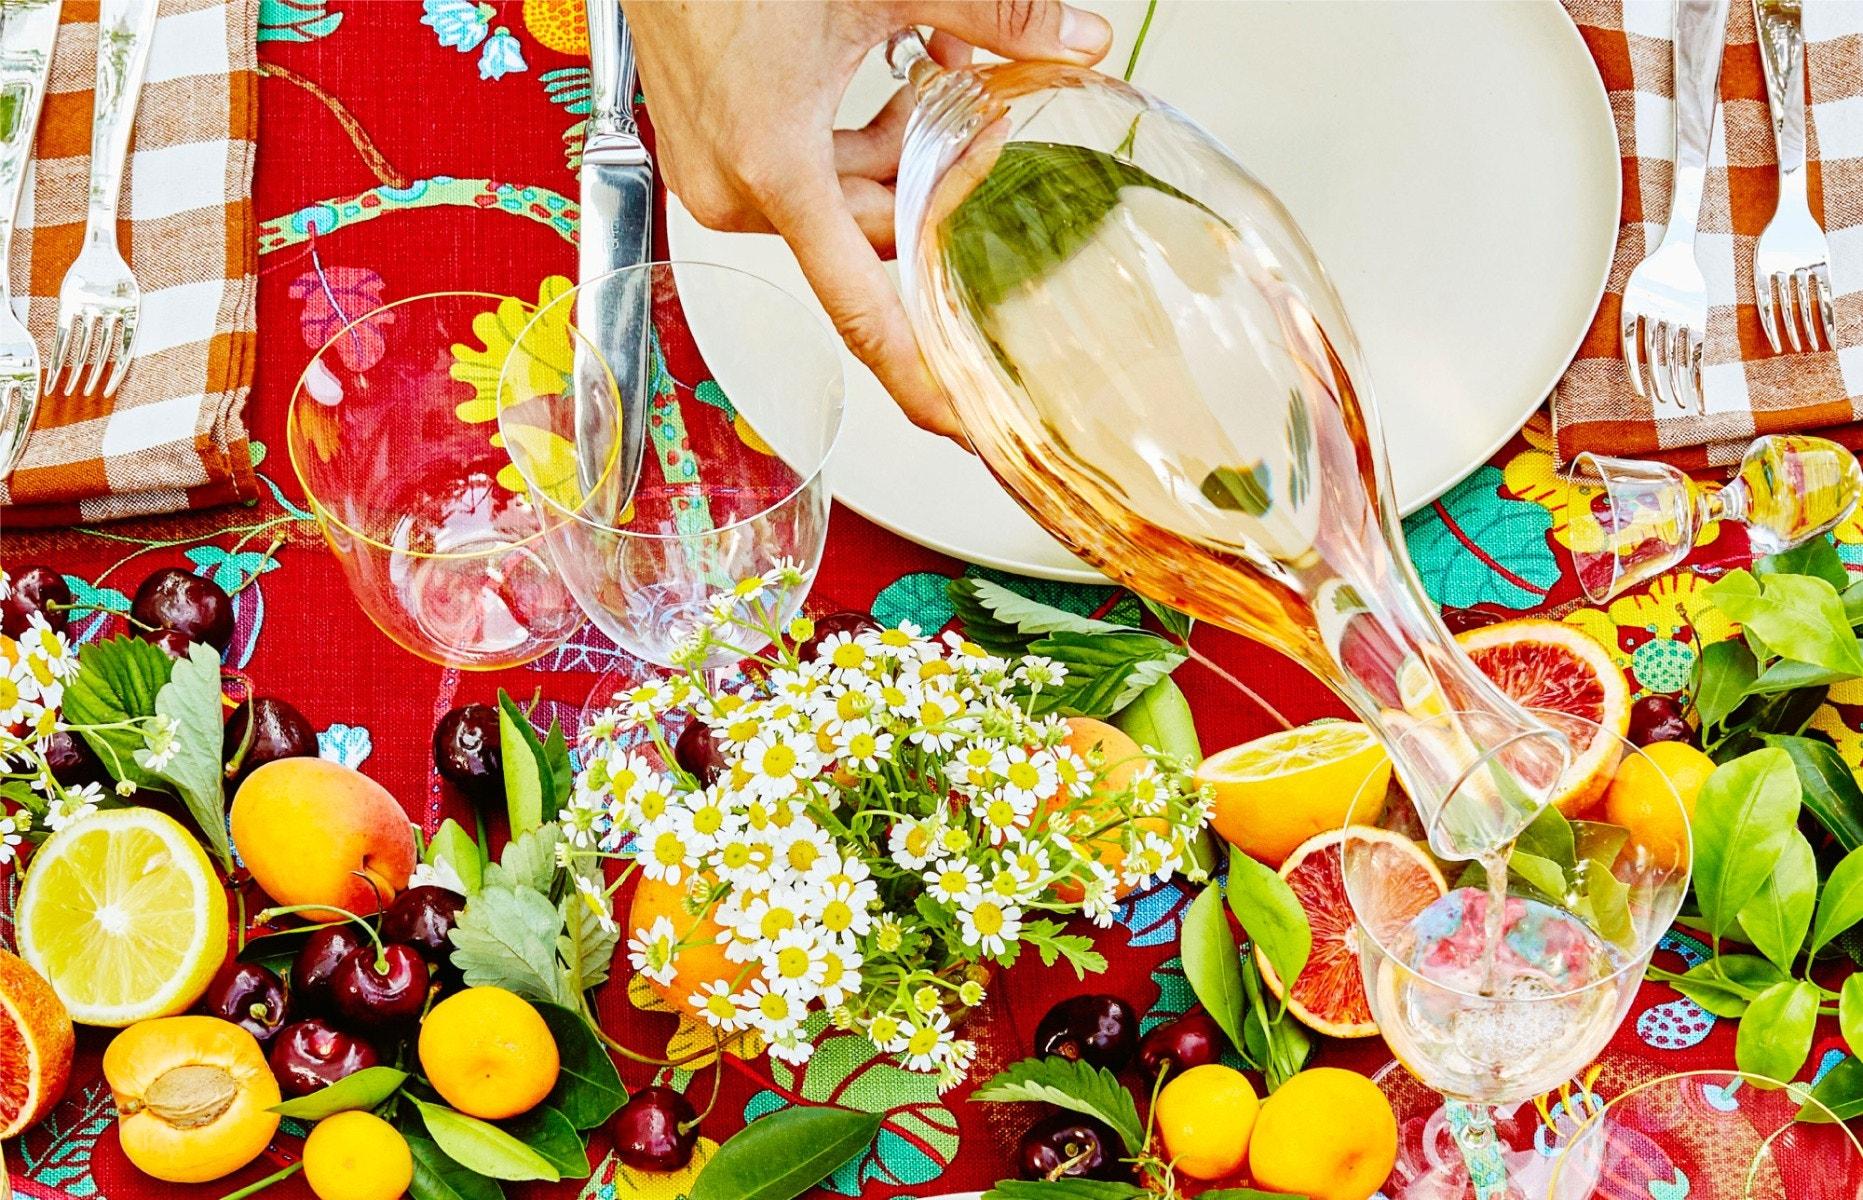 JOSEF HOFFMANN Patrician Wine Glass – JOSEF HOFFMANN Patrician Wine Decanter – HANS HARALD RATH Citron Alpha Water Tumbler